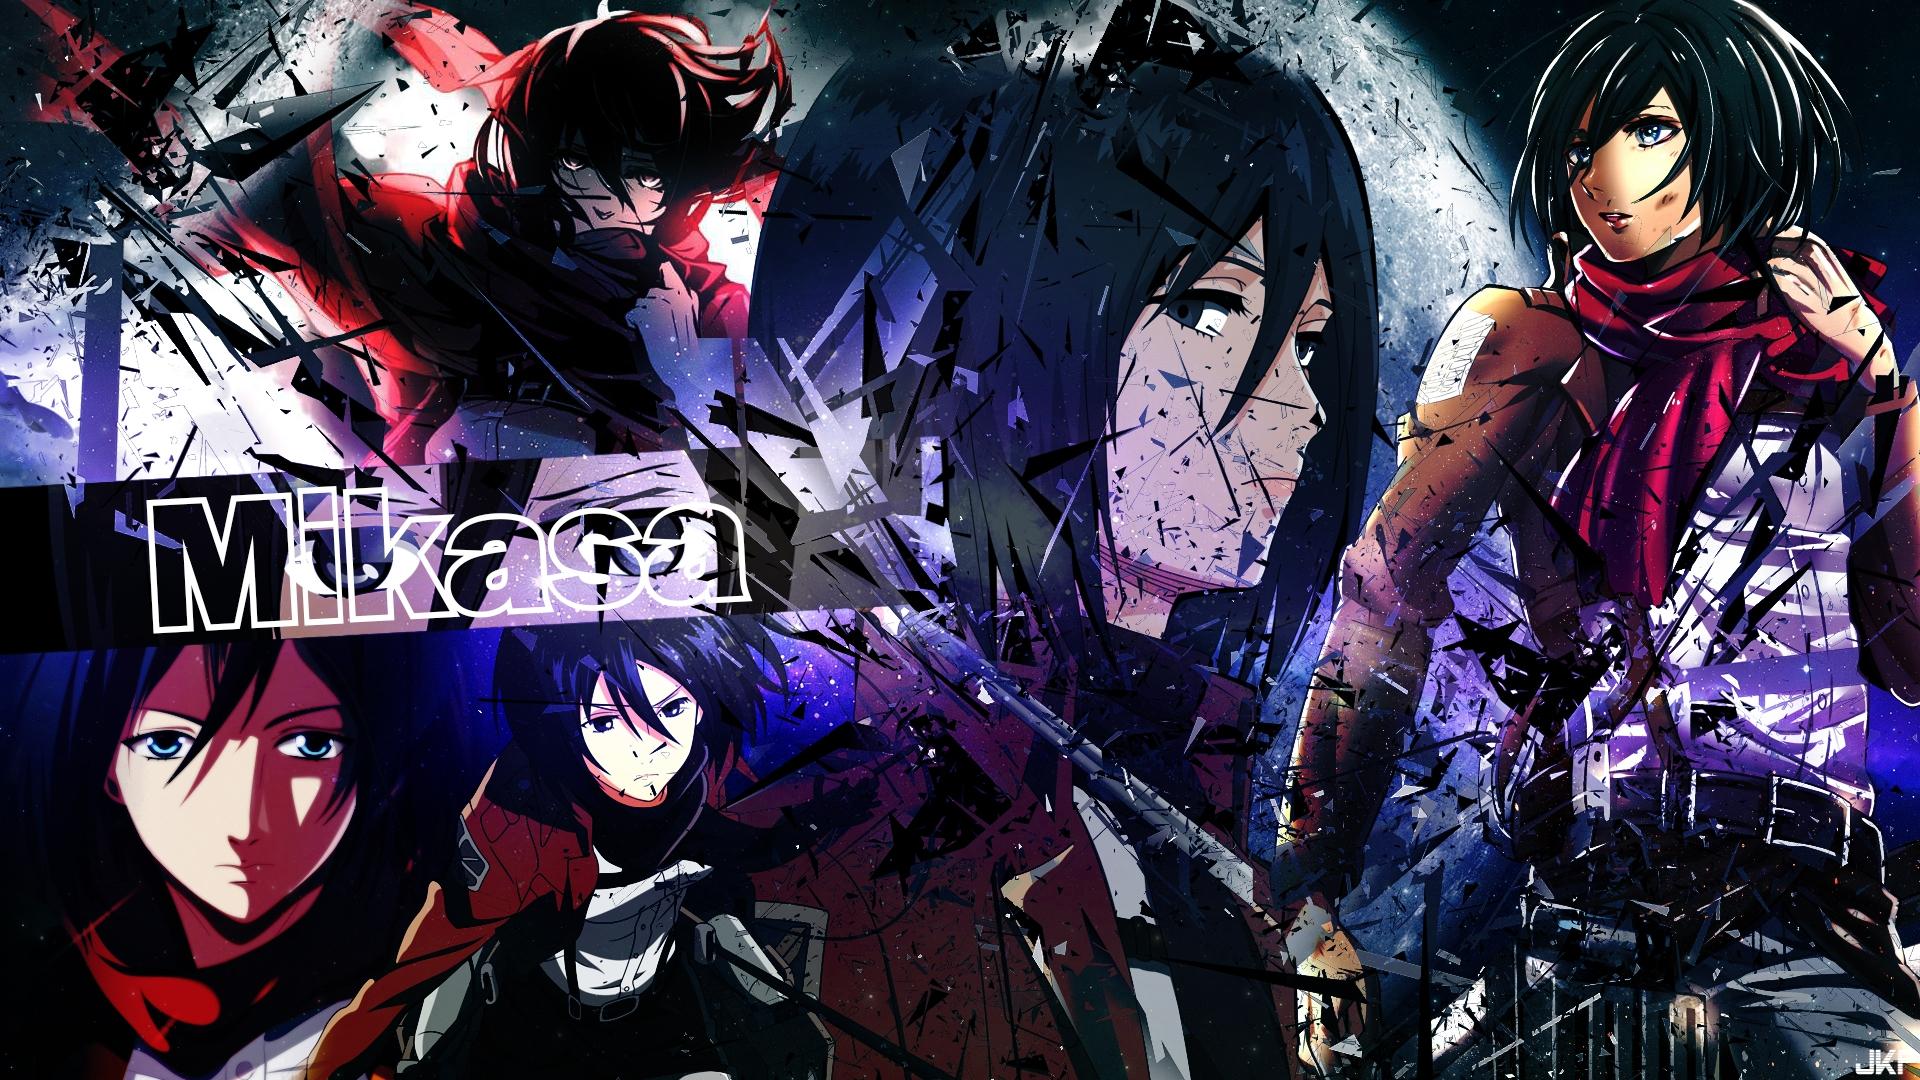 mikasa_wallpaper_by_dinocojv-d8d266s.jpg